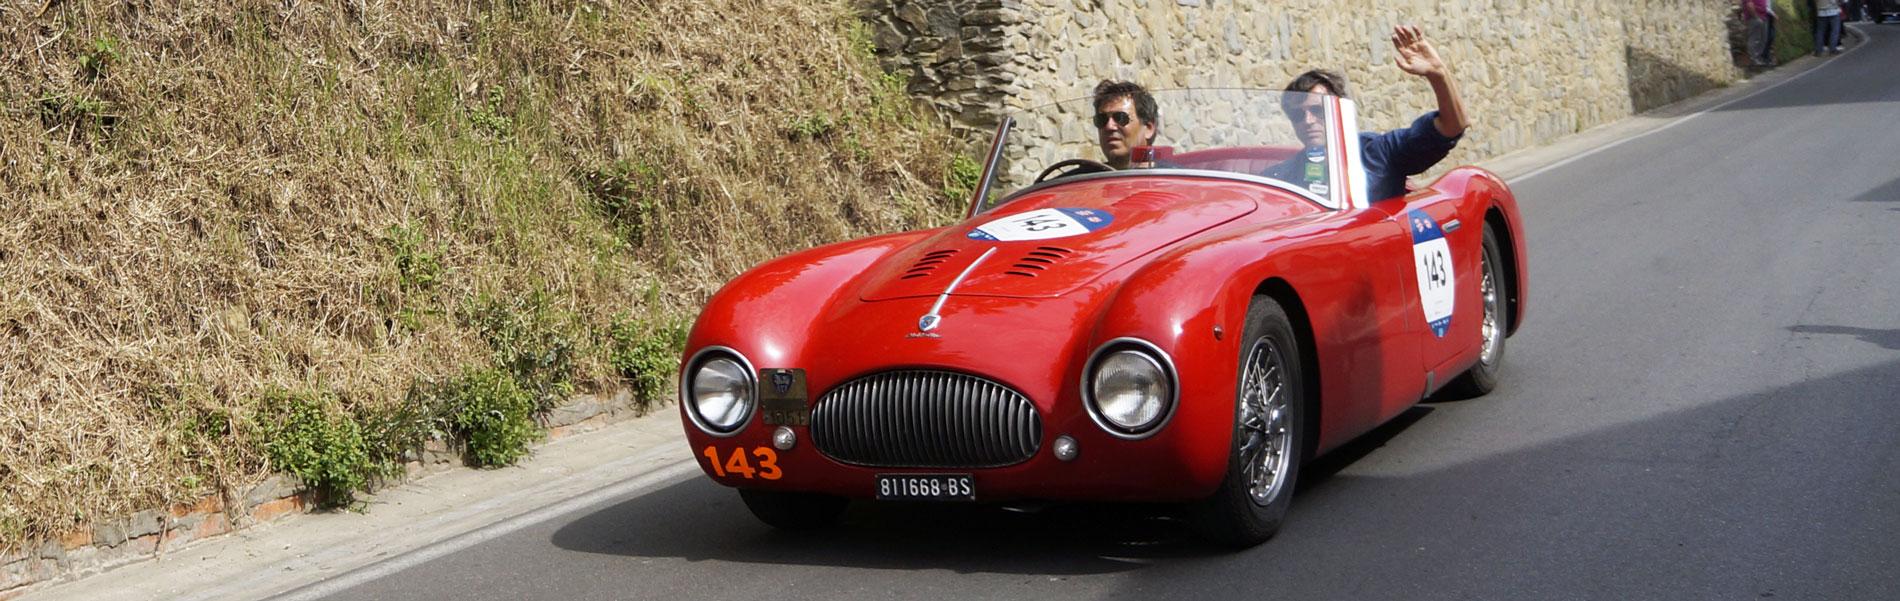 Cisitalia 202 MM - Mille Miglia 2019 - Vinci (c) Ciclootto